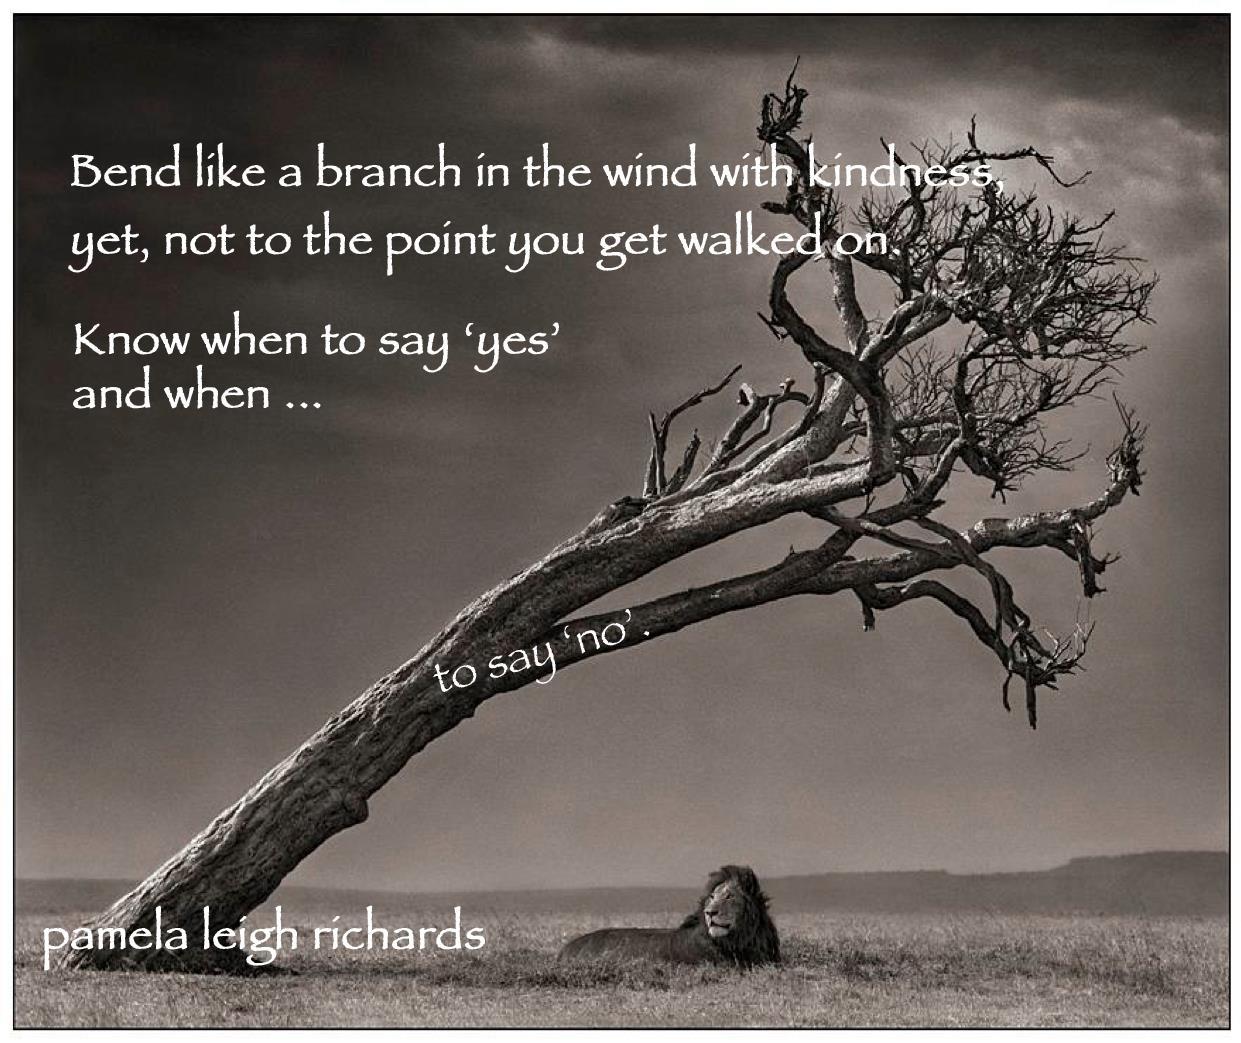 Lion-Tree-Bending-like-a-branch-pamela-quote.jpg